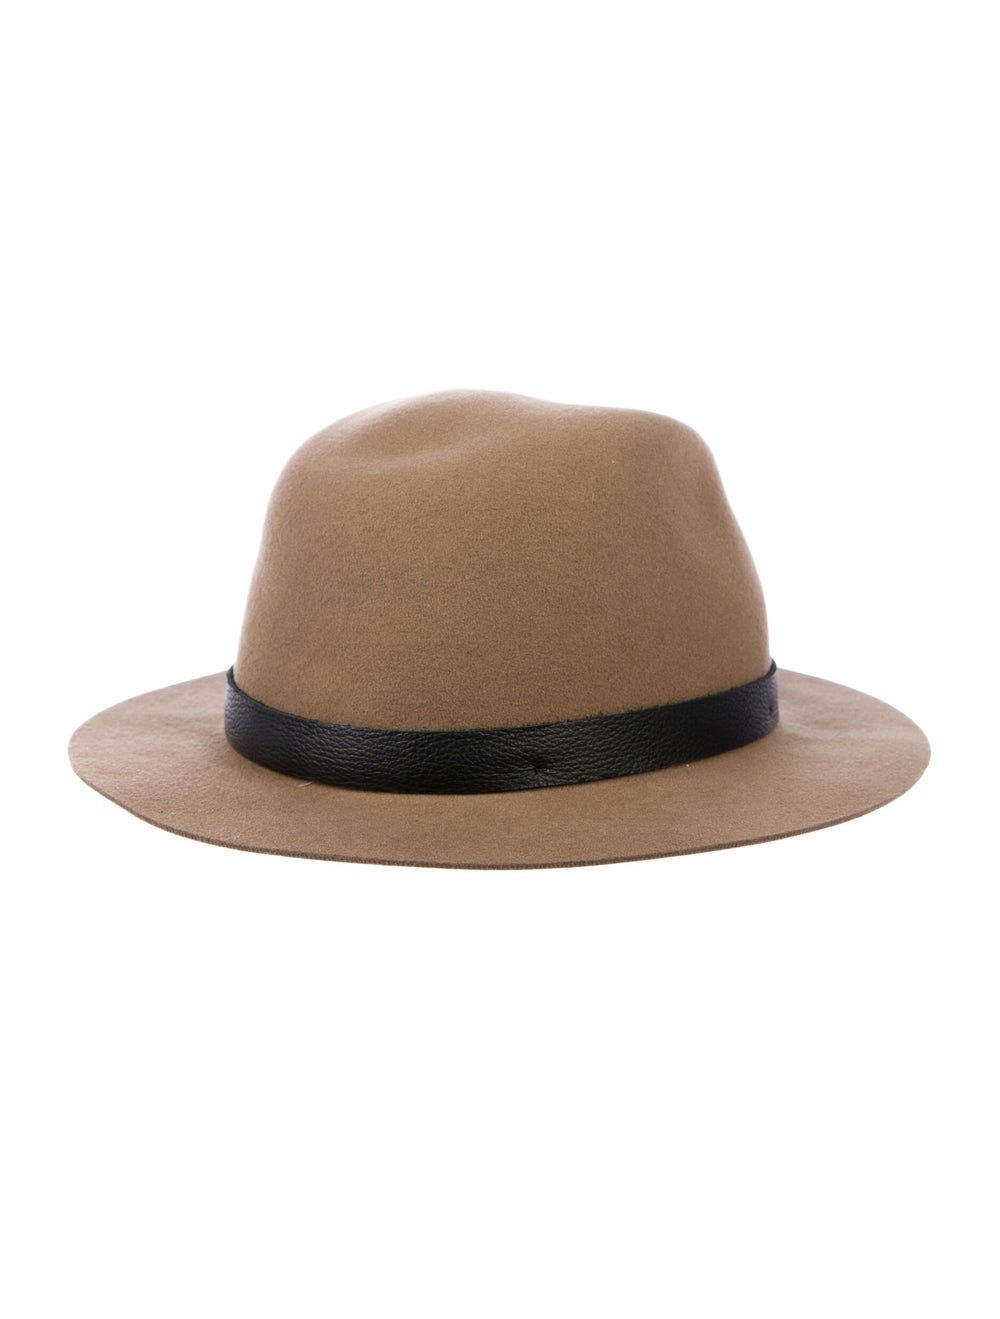 Rag & Bone Wool Fedora Hat Brown - image 2